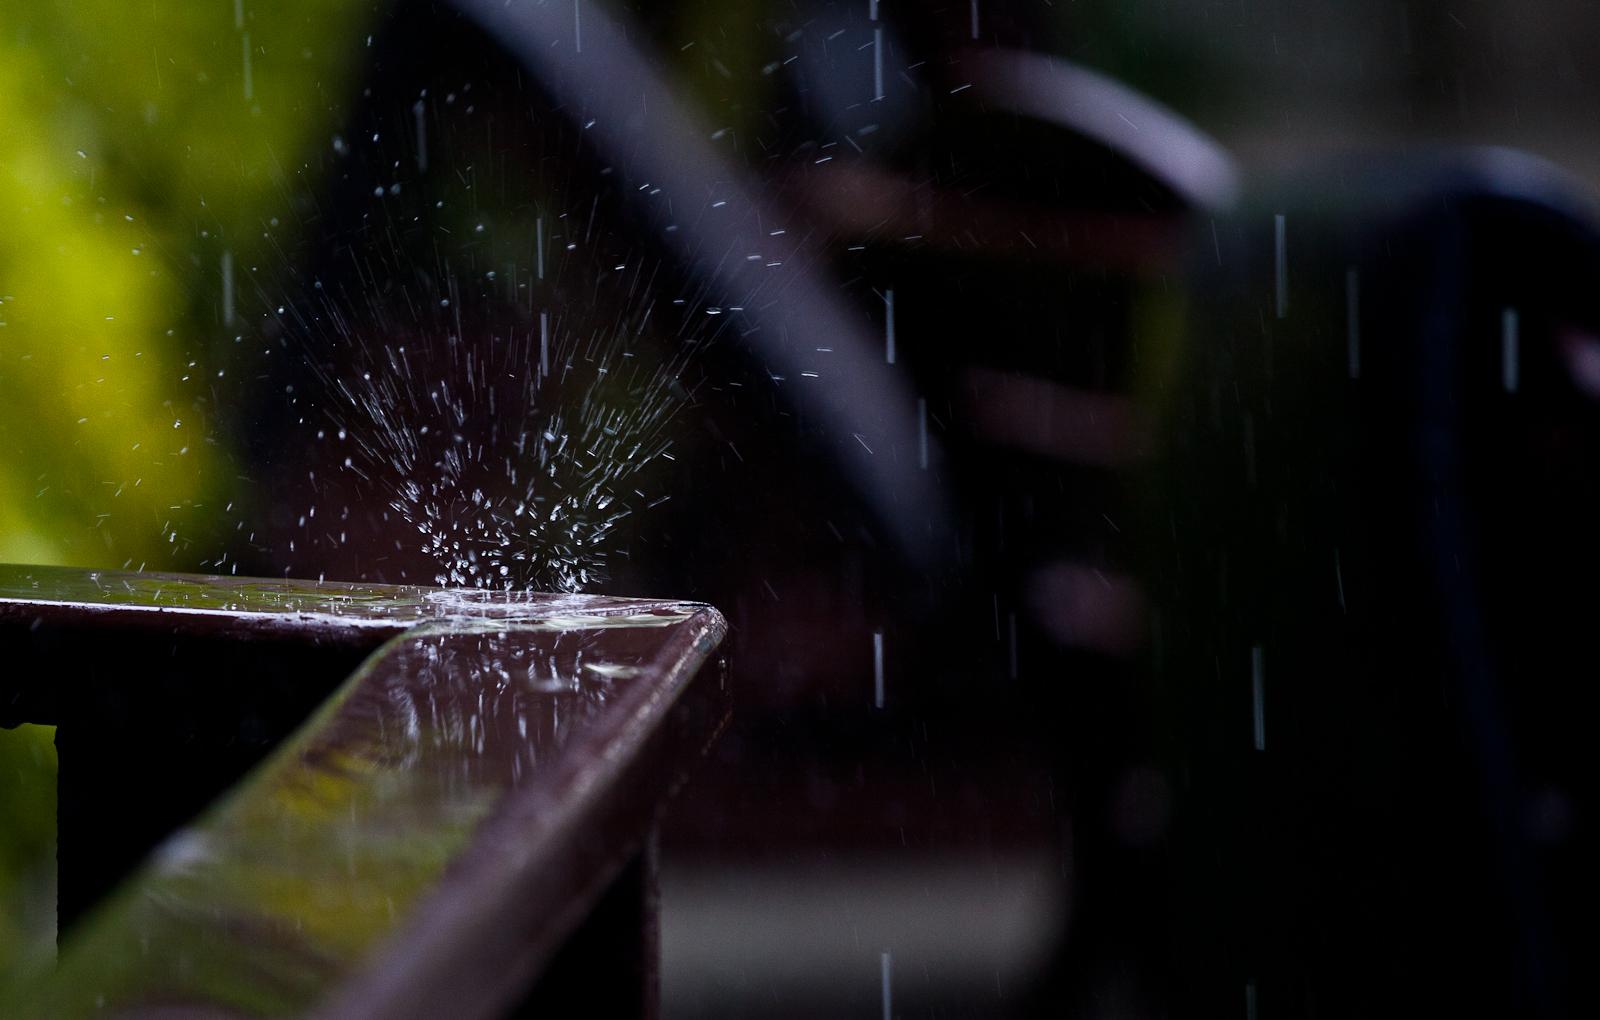 dPS Weekly Photography Challenge Rain